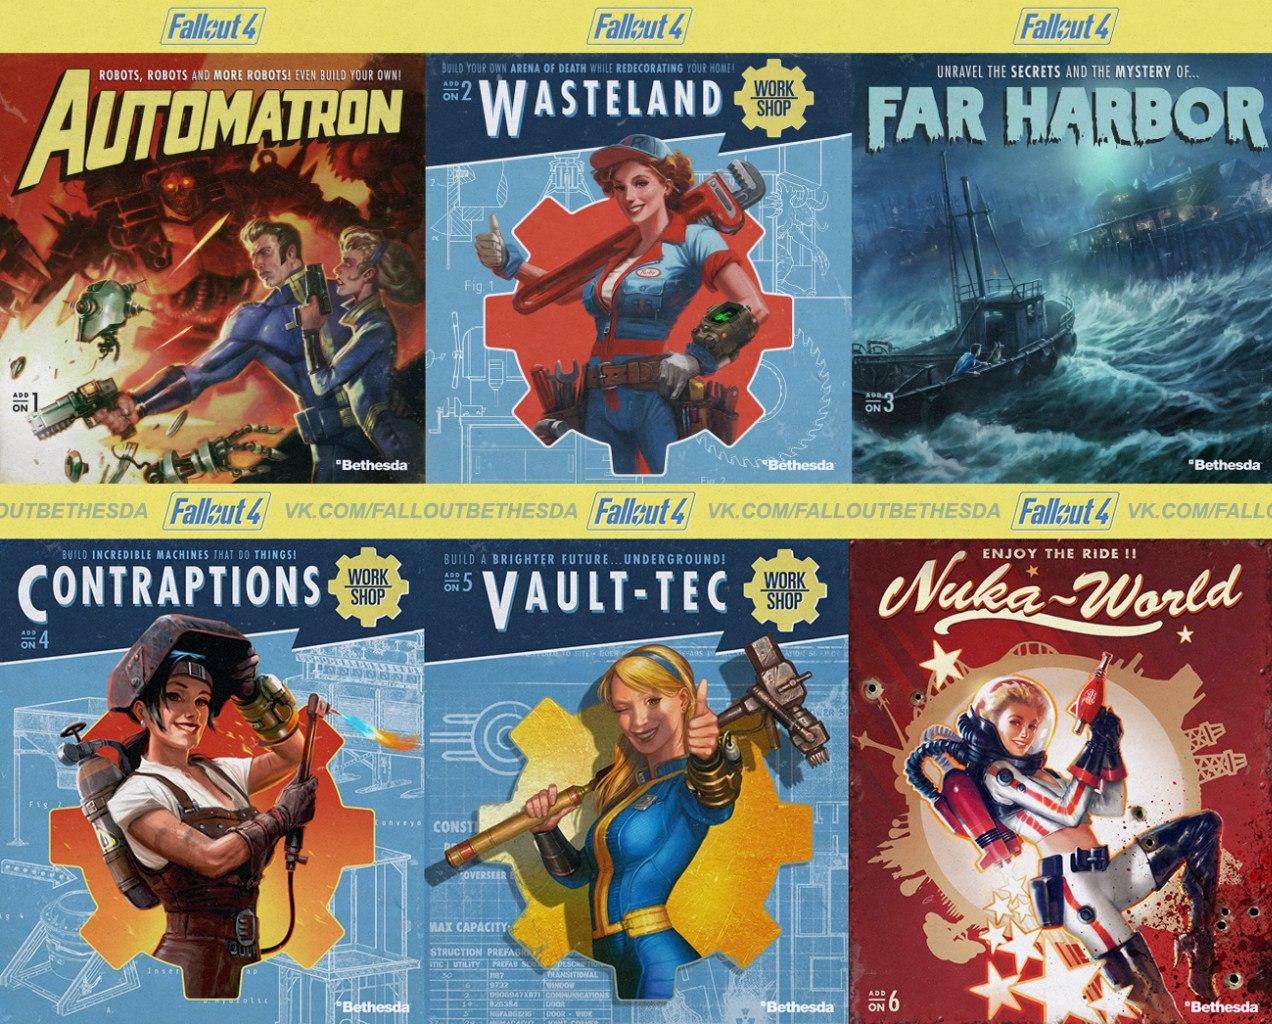 Все DLC для Fallout4